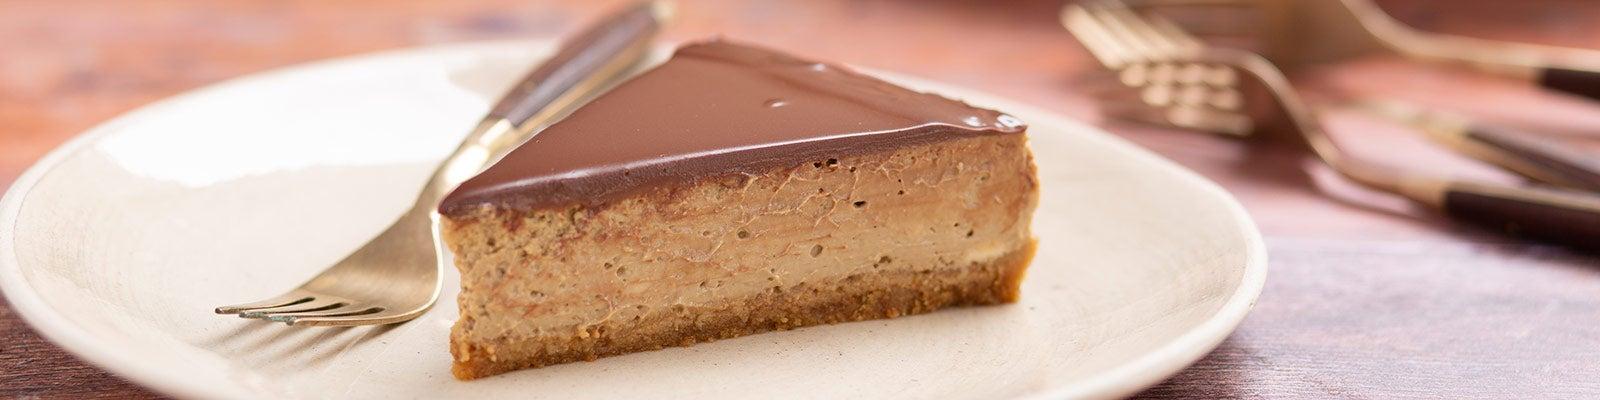 latte-cheesecake-recipe-header-desktop